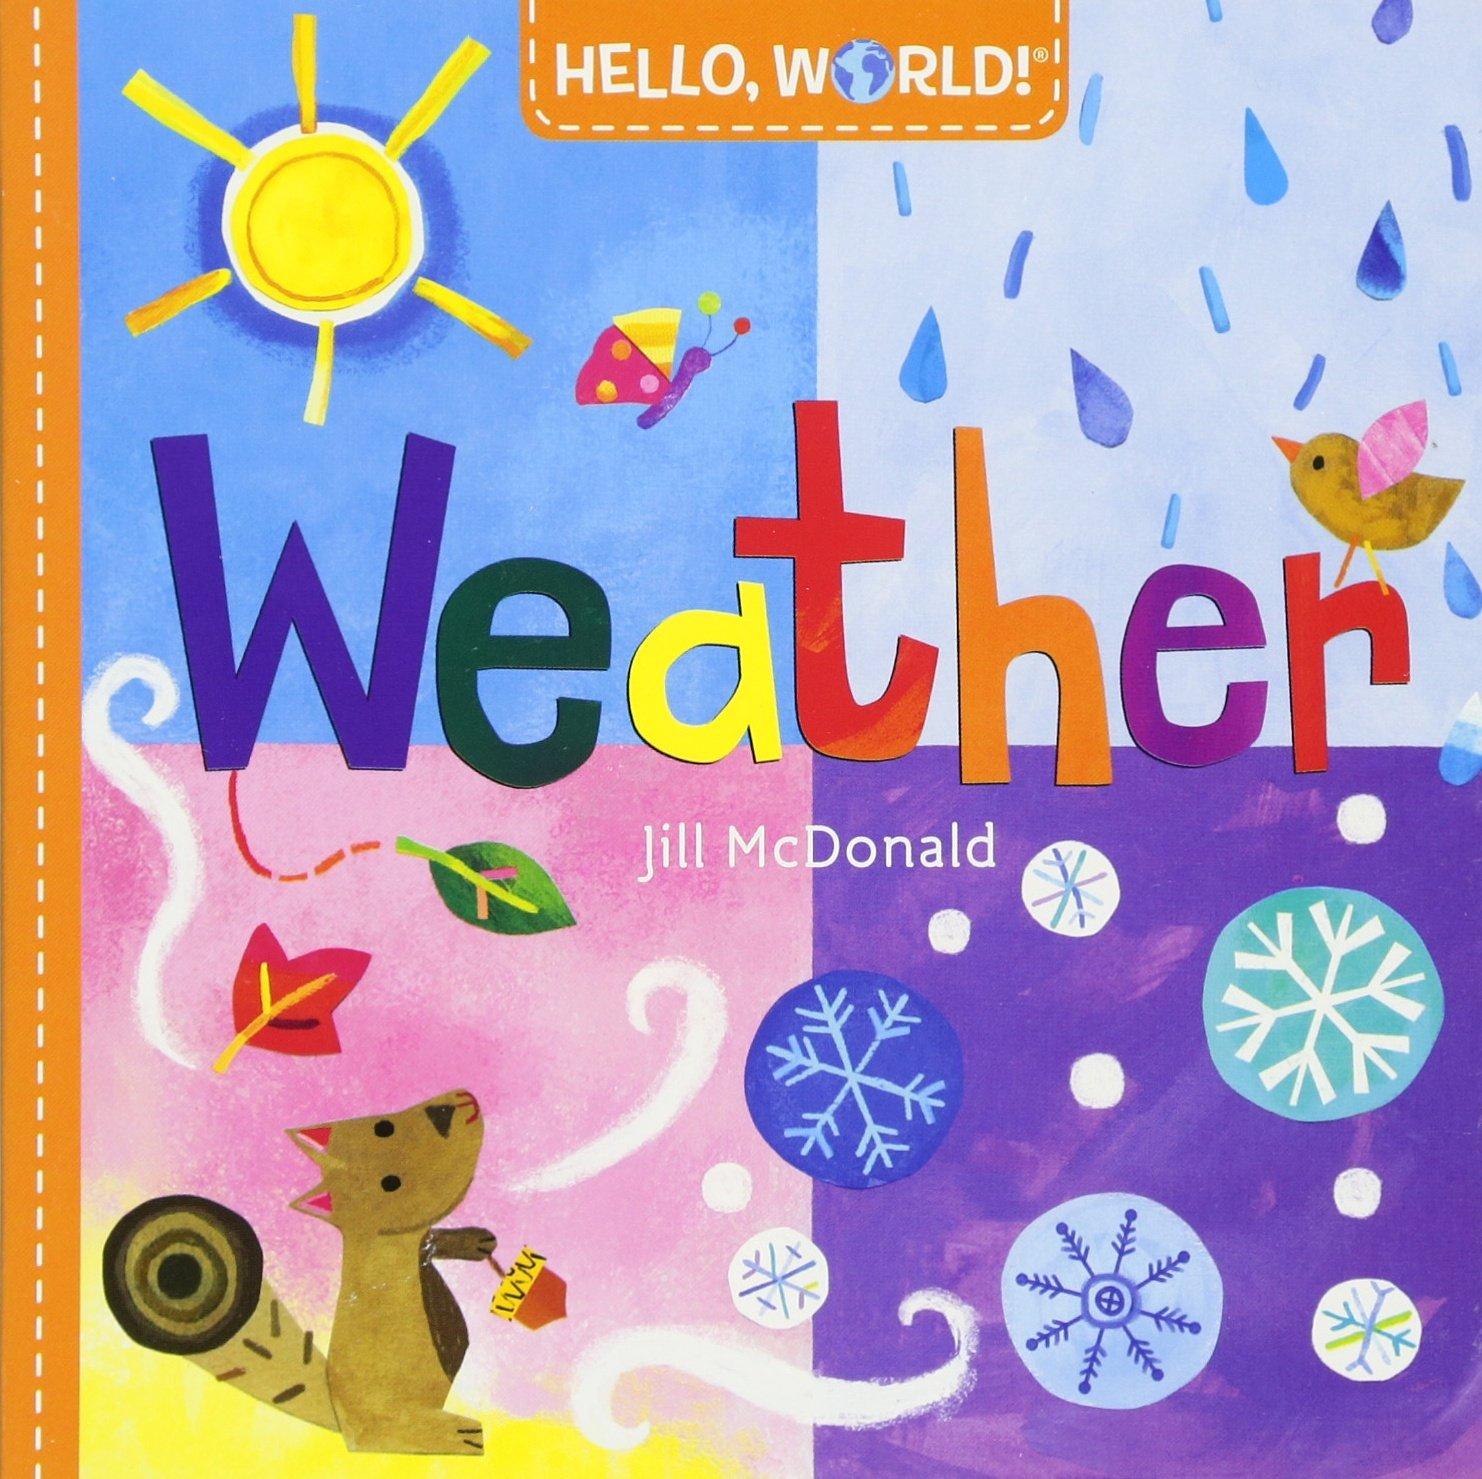 amazon com hello world weather 9780553521016 jill mcdonald